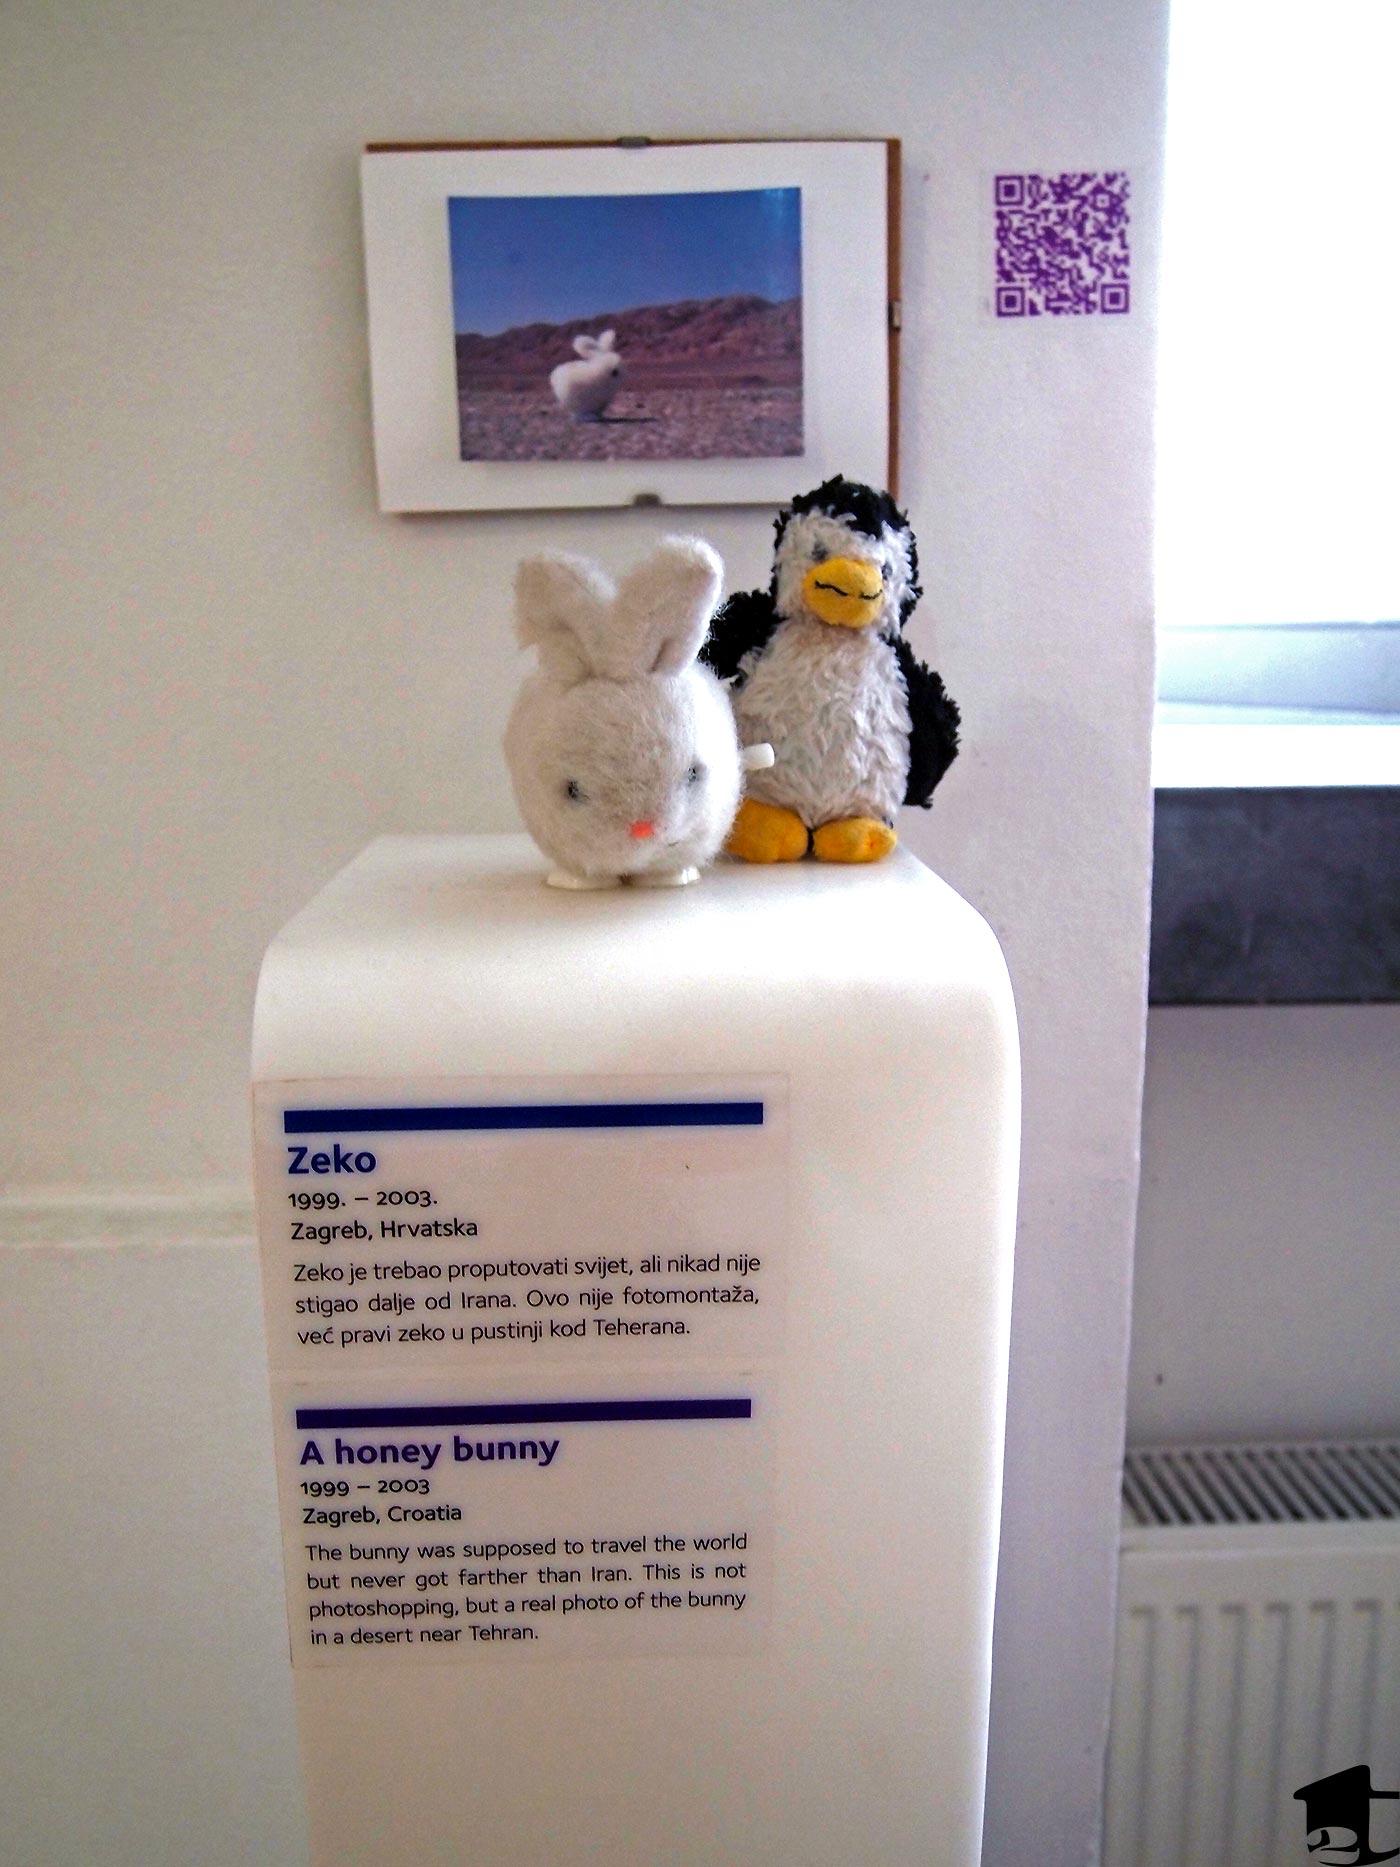 pluszowy królik i pingwin